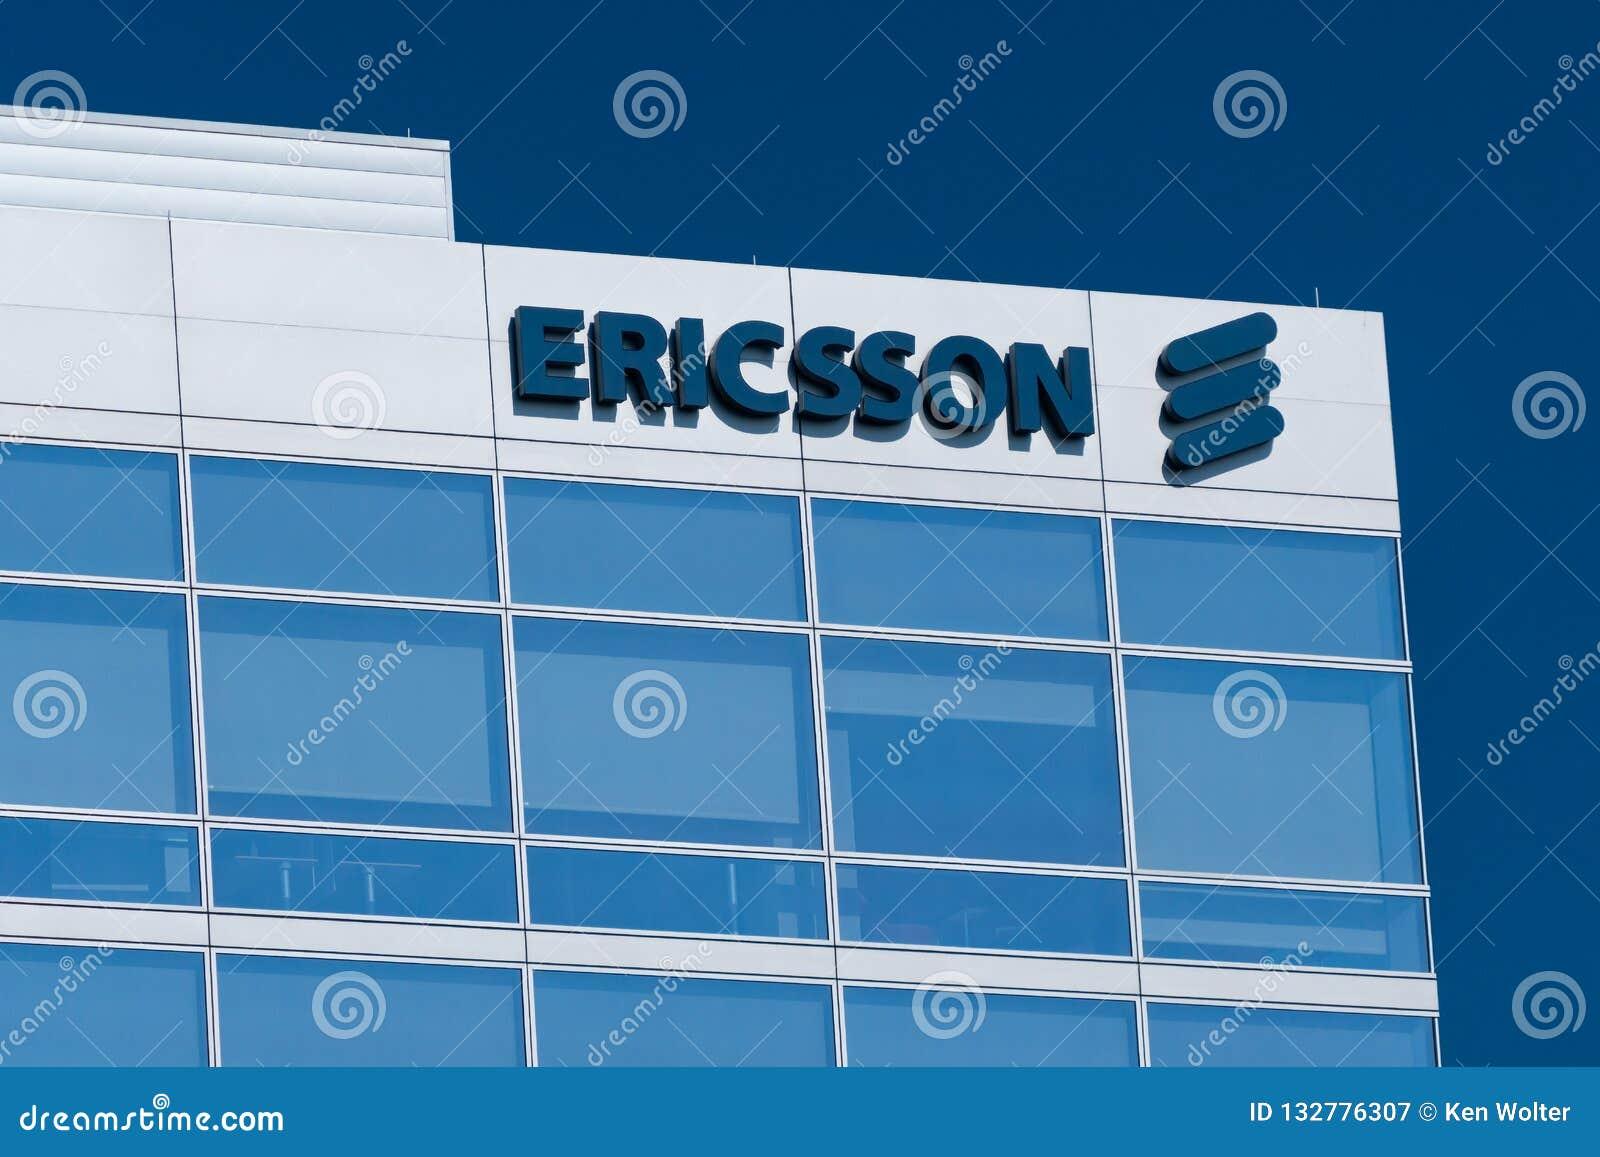 Ericsson Silicon Valley Corporate Campus Editorial